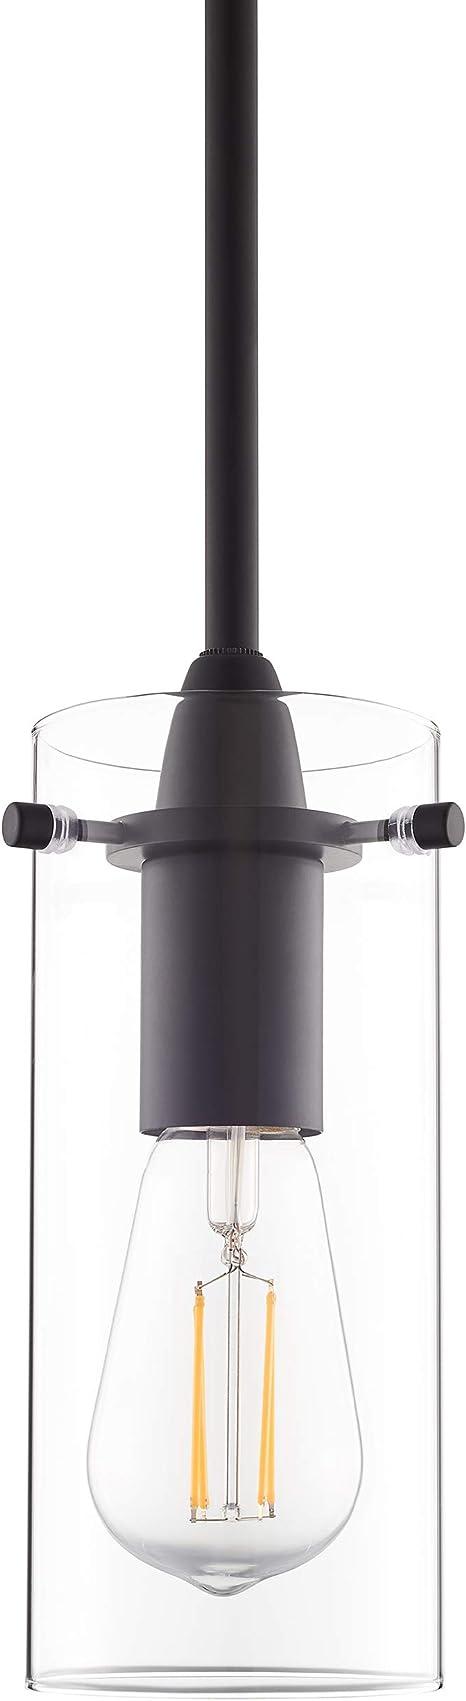 Black Pendant Light Modern Effimero Mini Pendant Lighting For Kitchen Island Decor Clear Glass Fixture With Small Lamp Shade Amazon Com